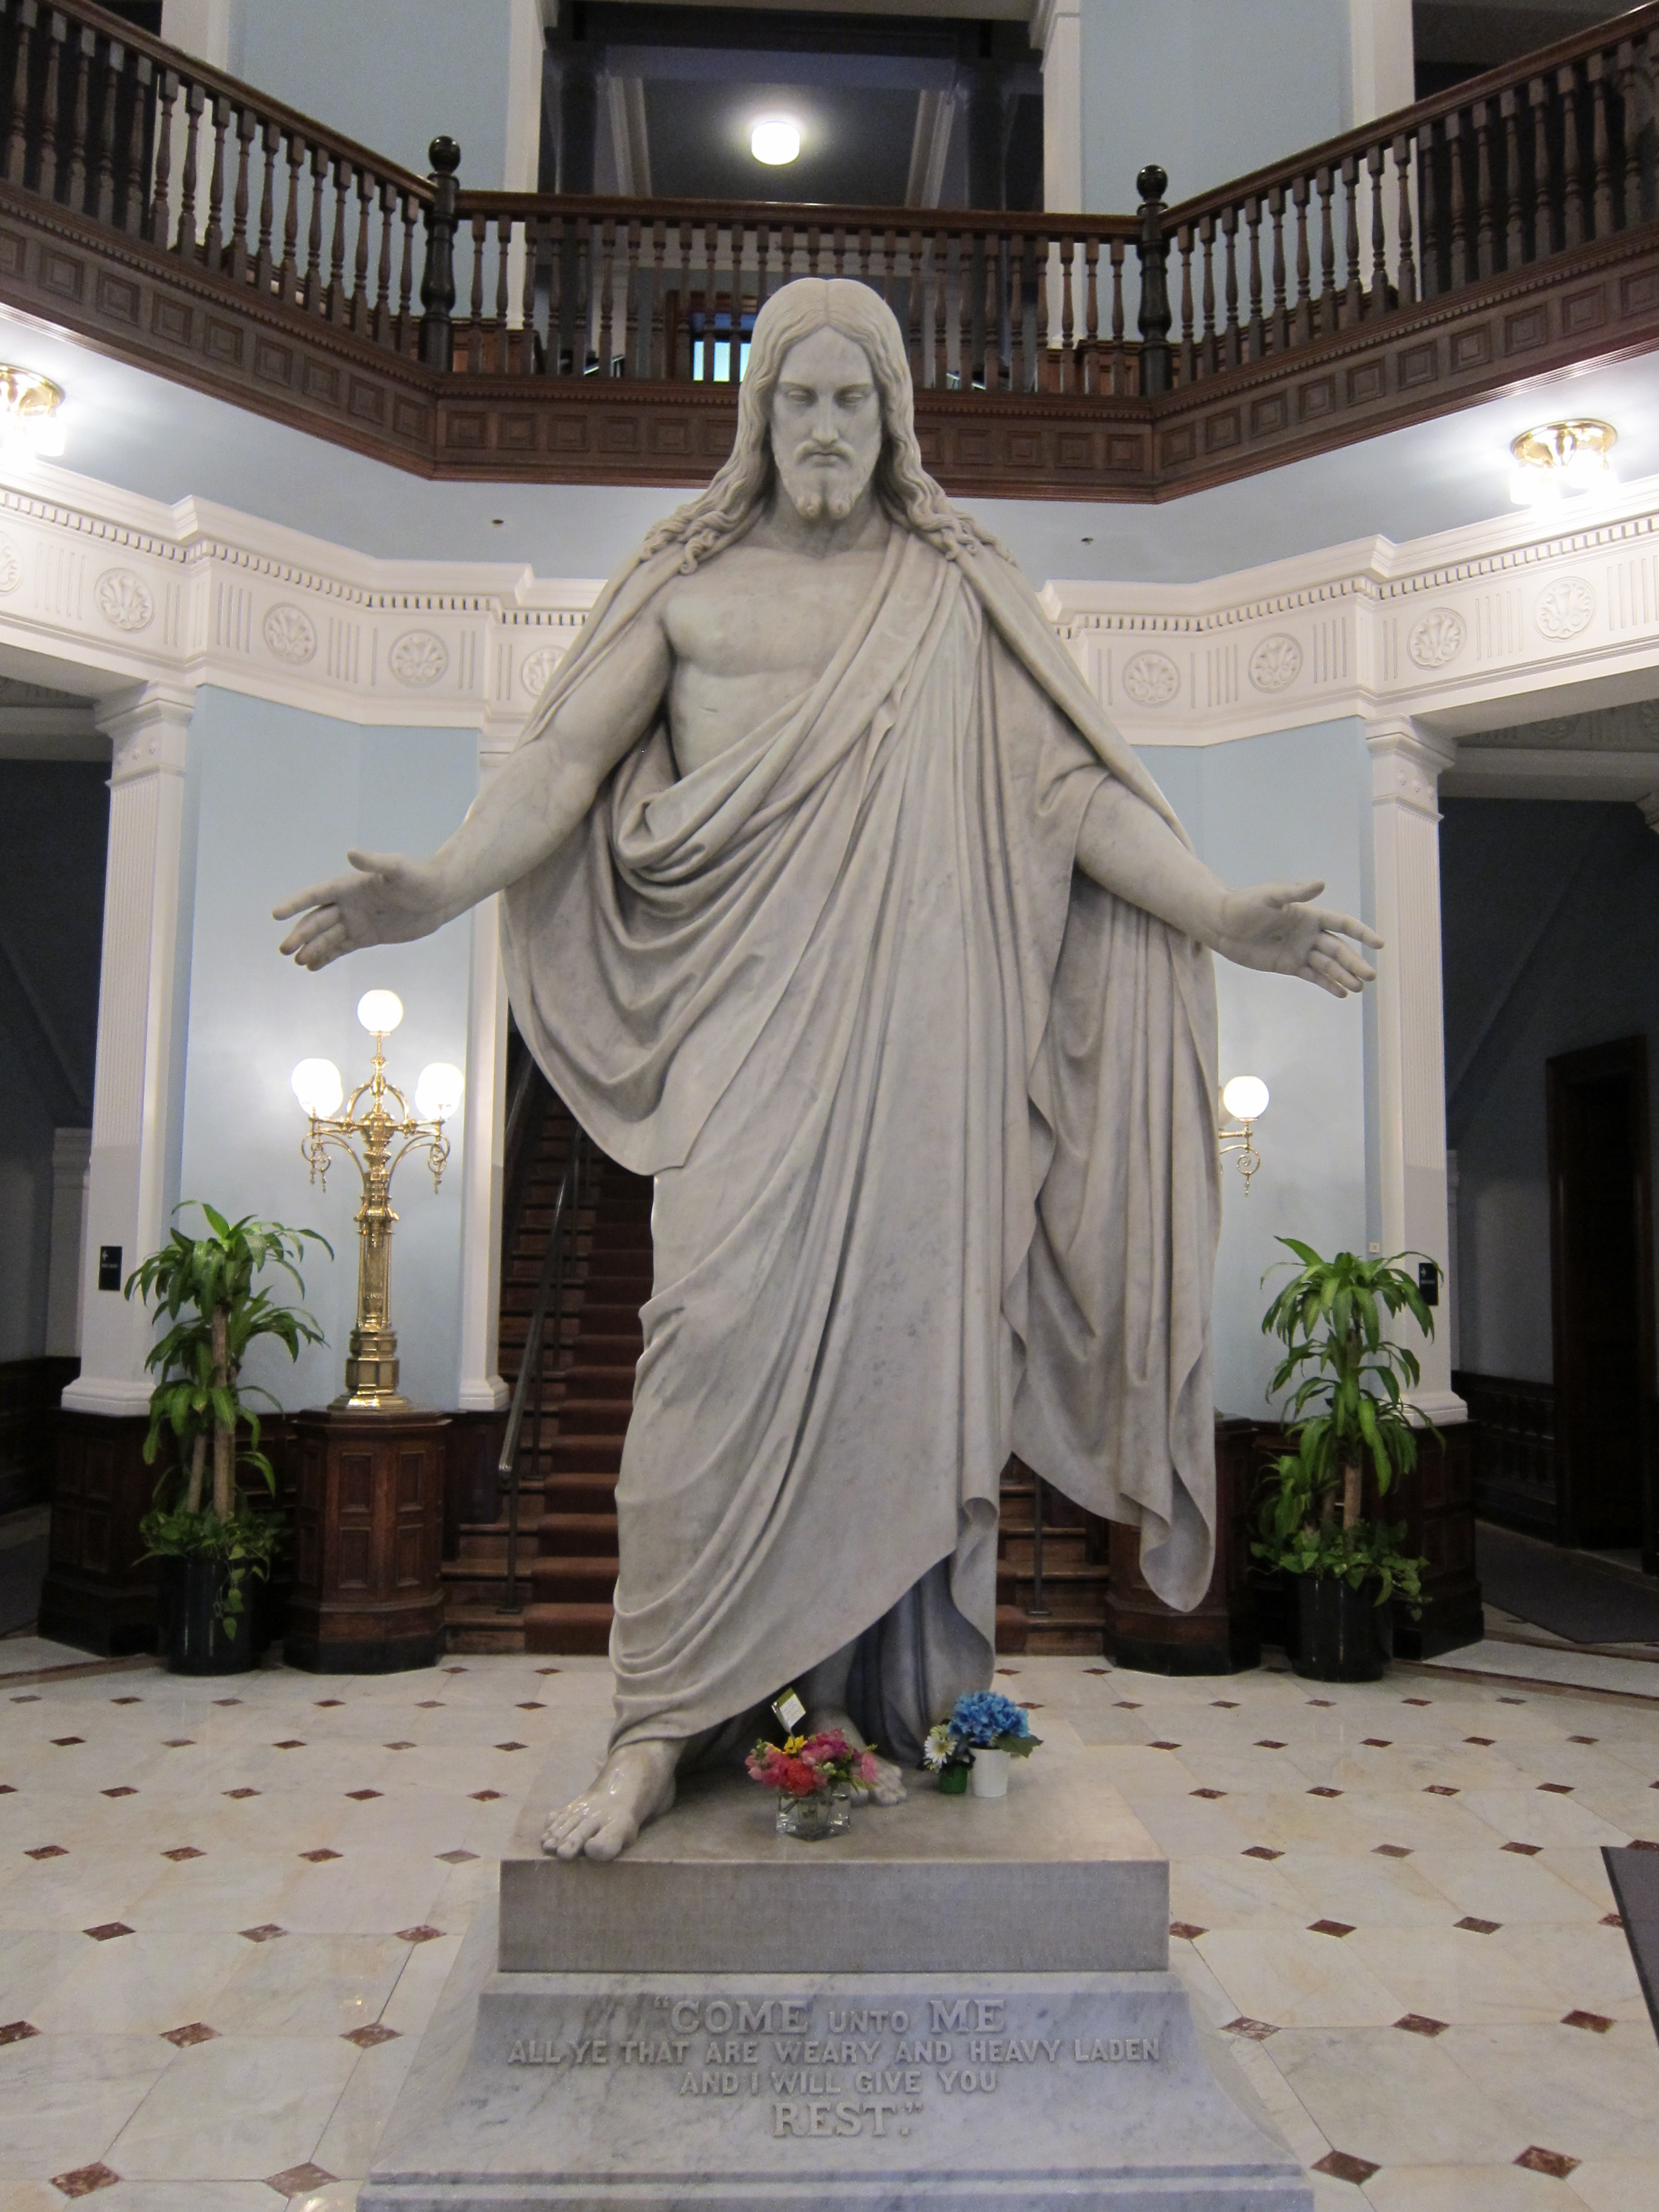 File:Bertel Thorvaldsen's Christus - under the Dome at Johns Hopkins